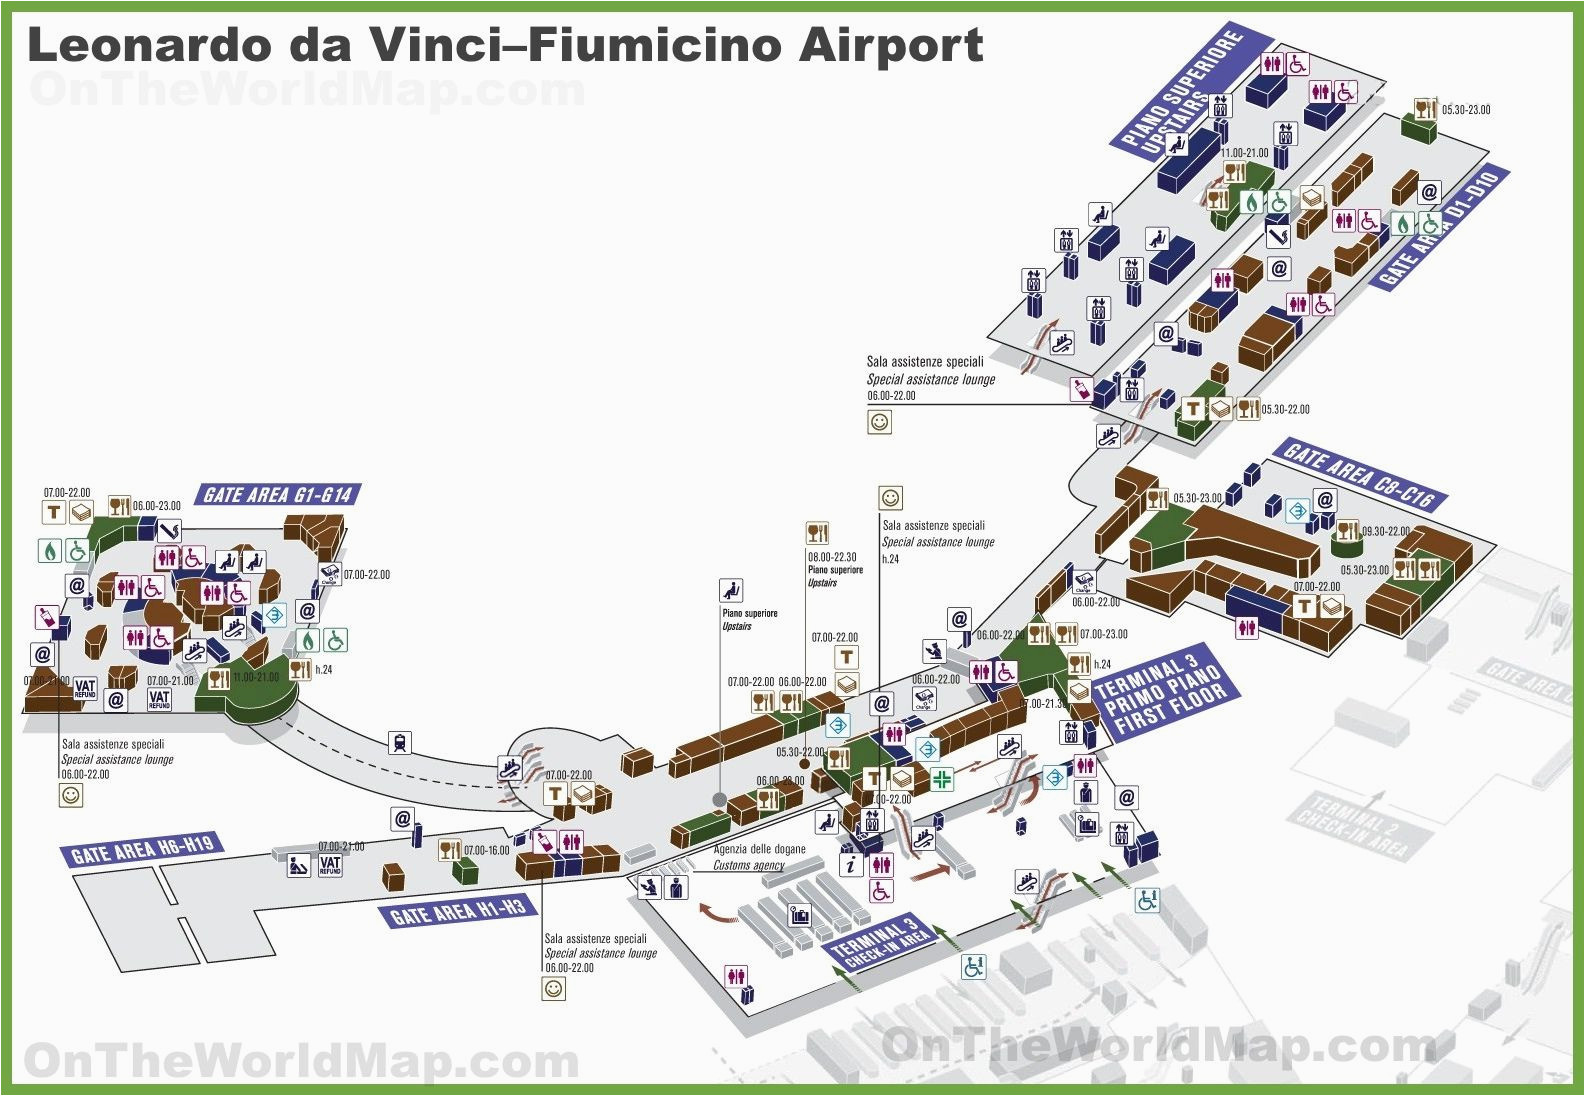 Airport In Italy Map Pin by Jeannette Beaver On Pilot In 2019 Leonardo Da Vinci Rome